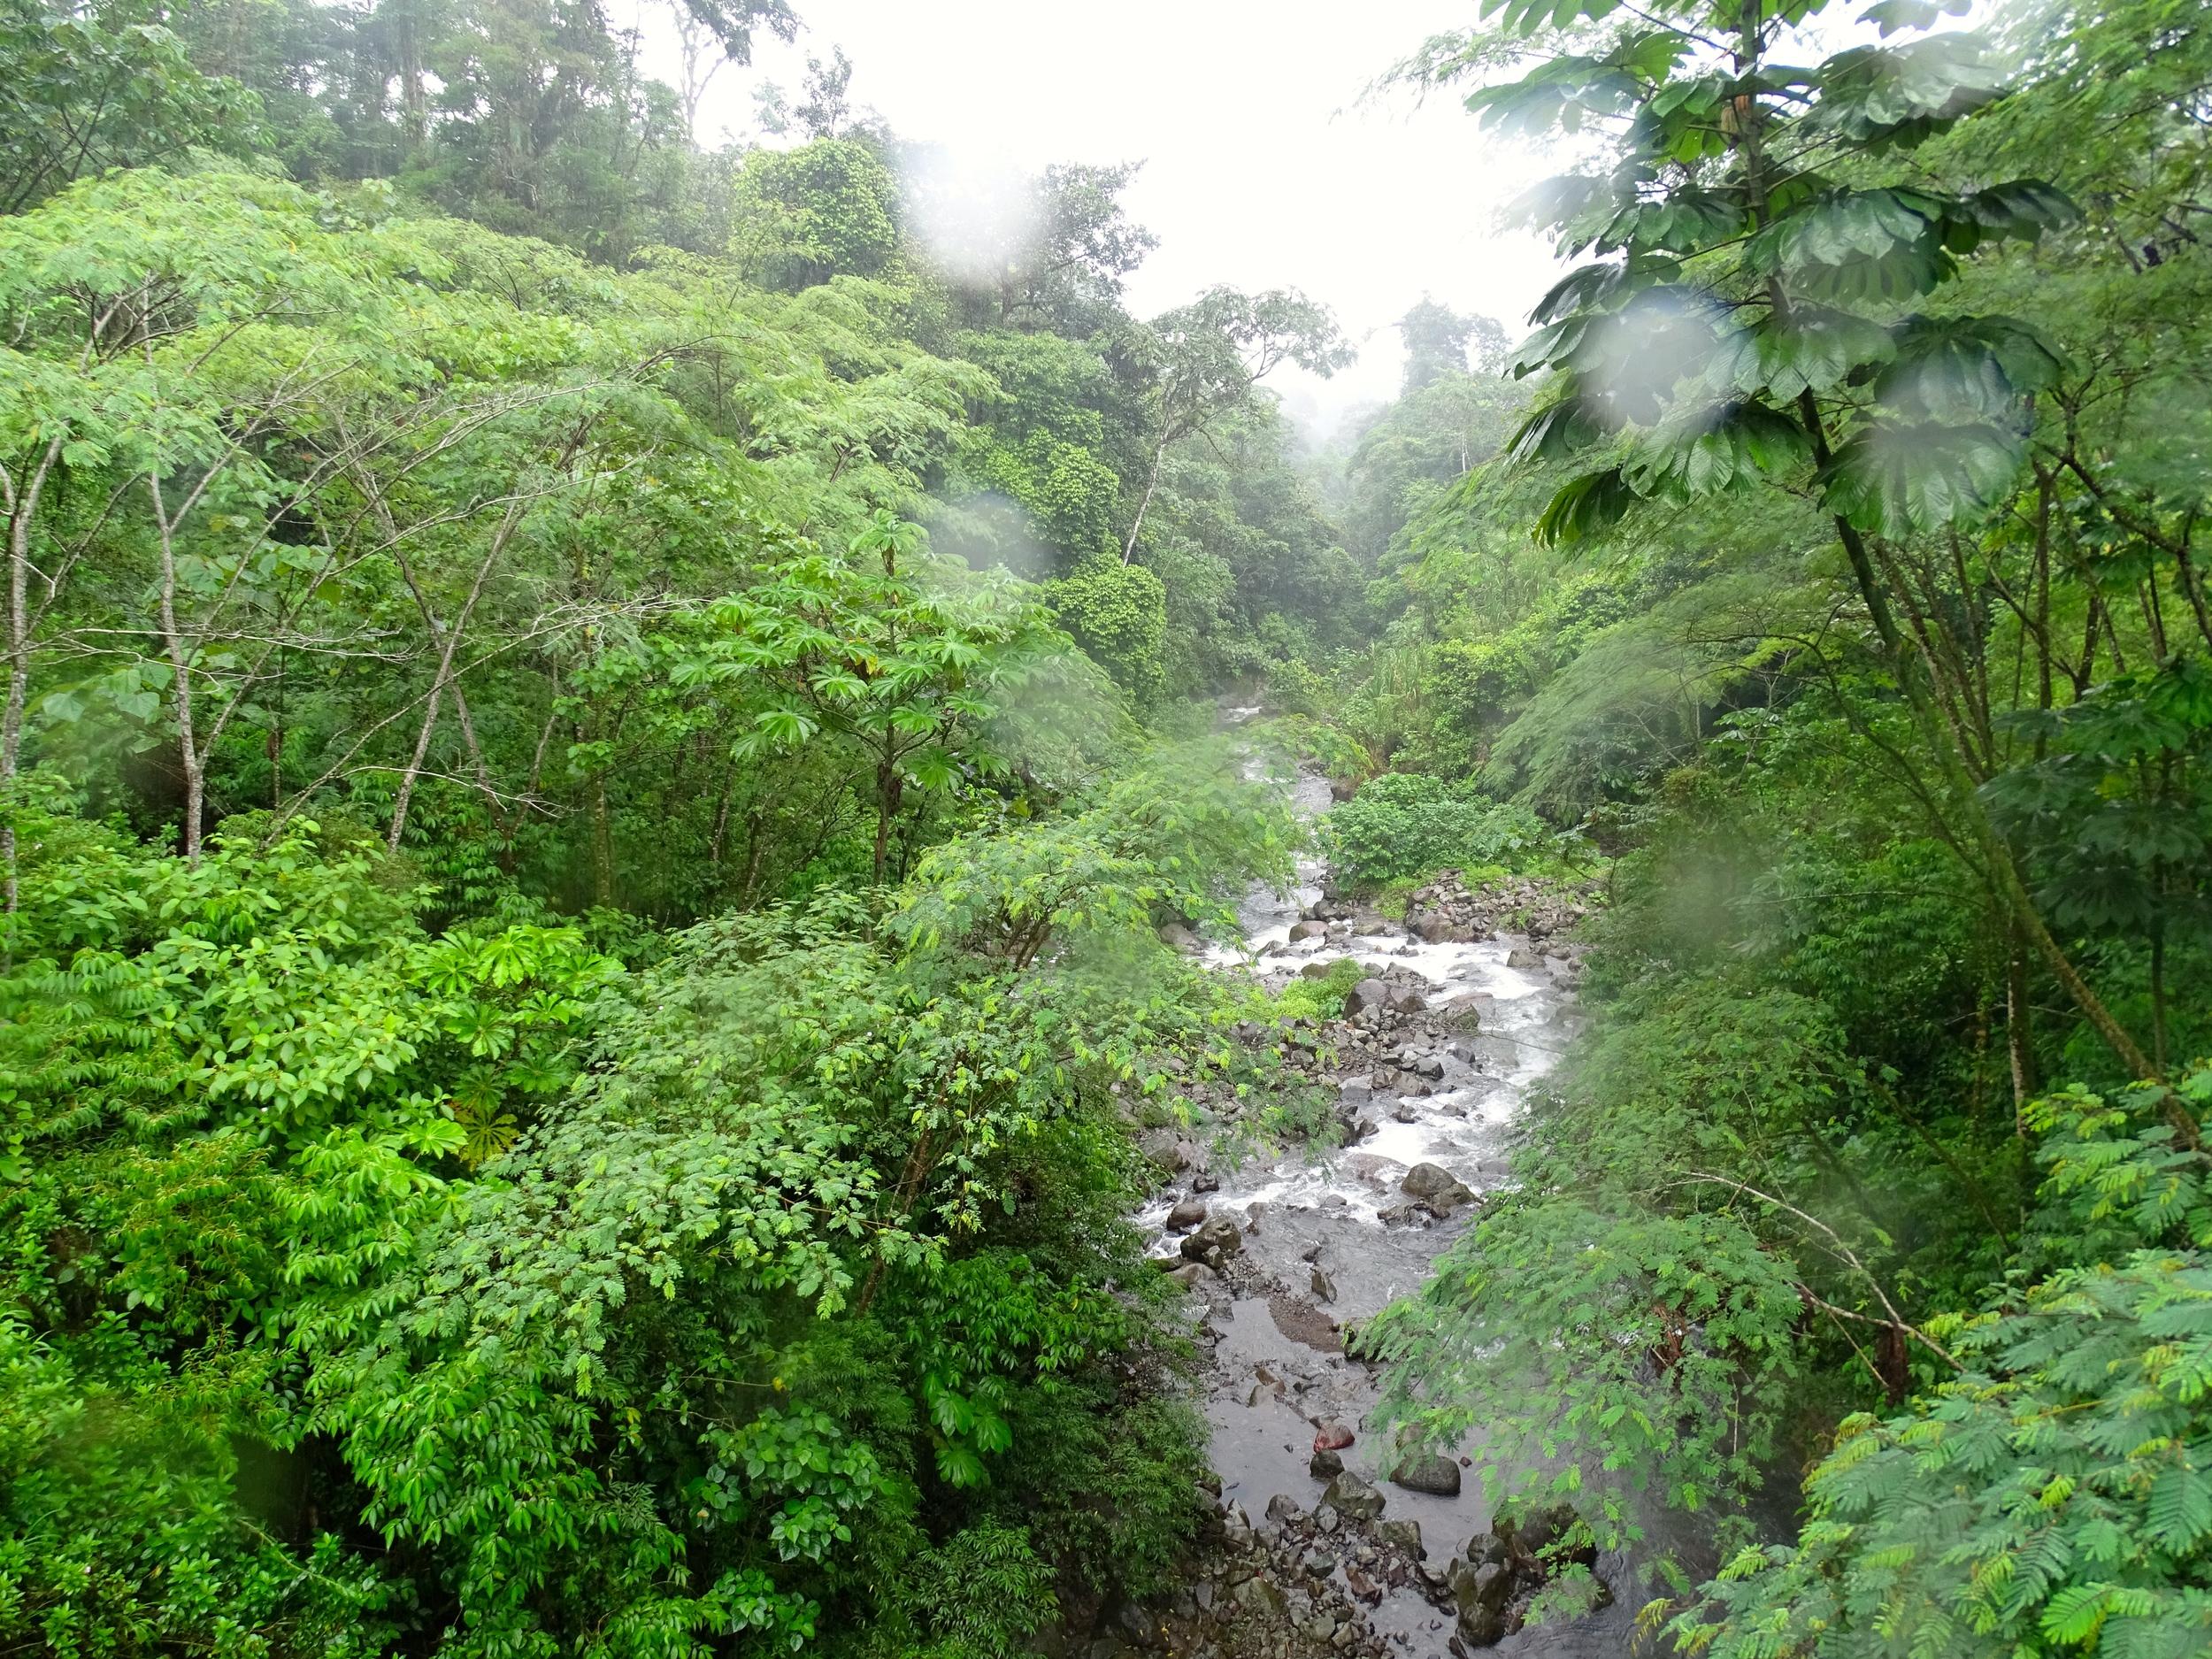 Wet side of Panama